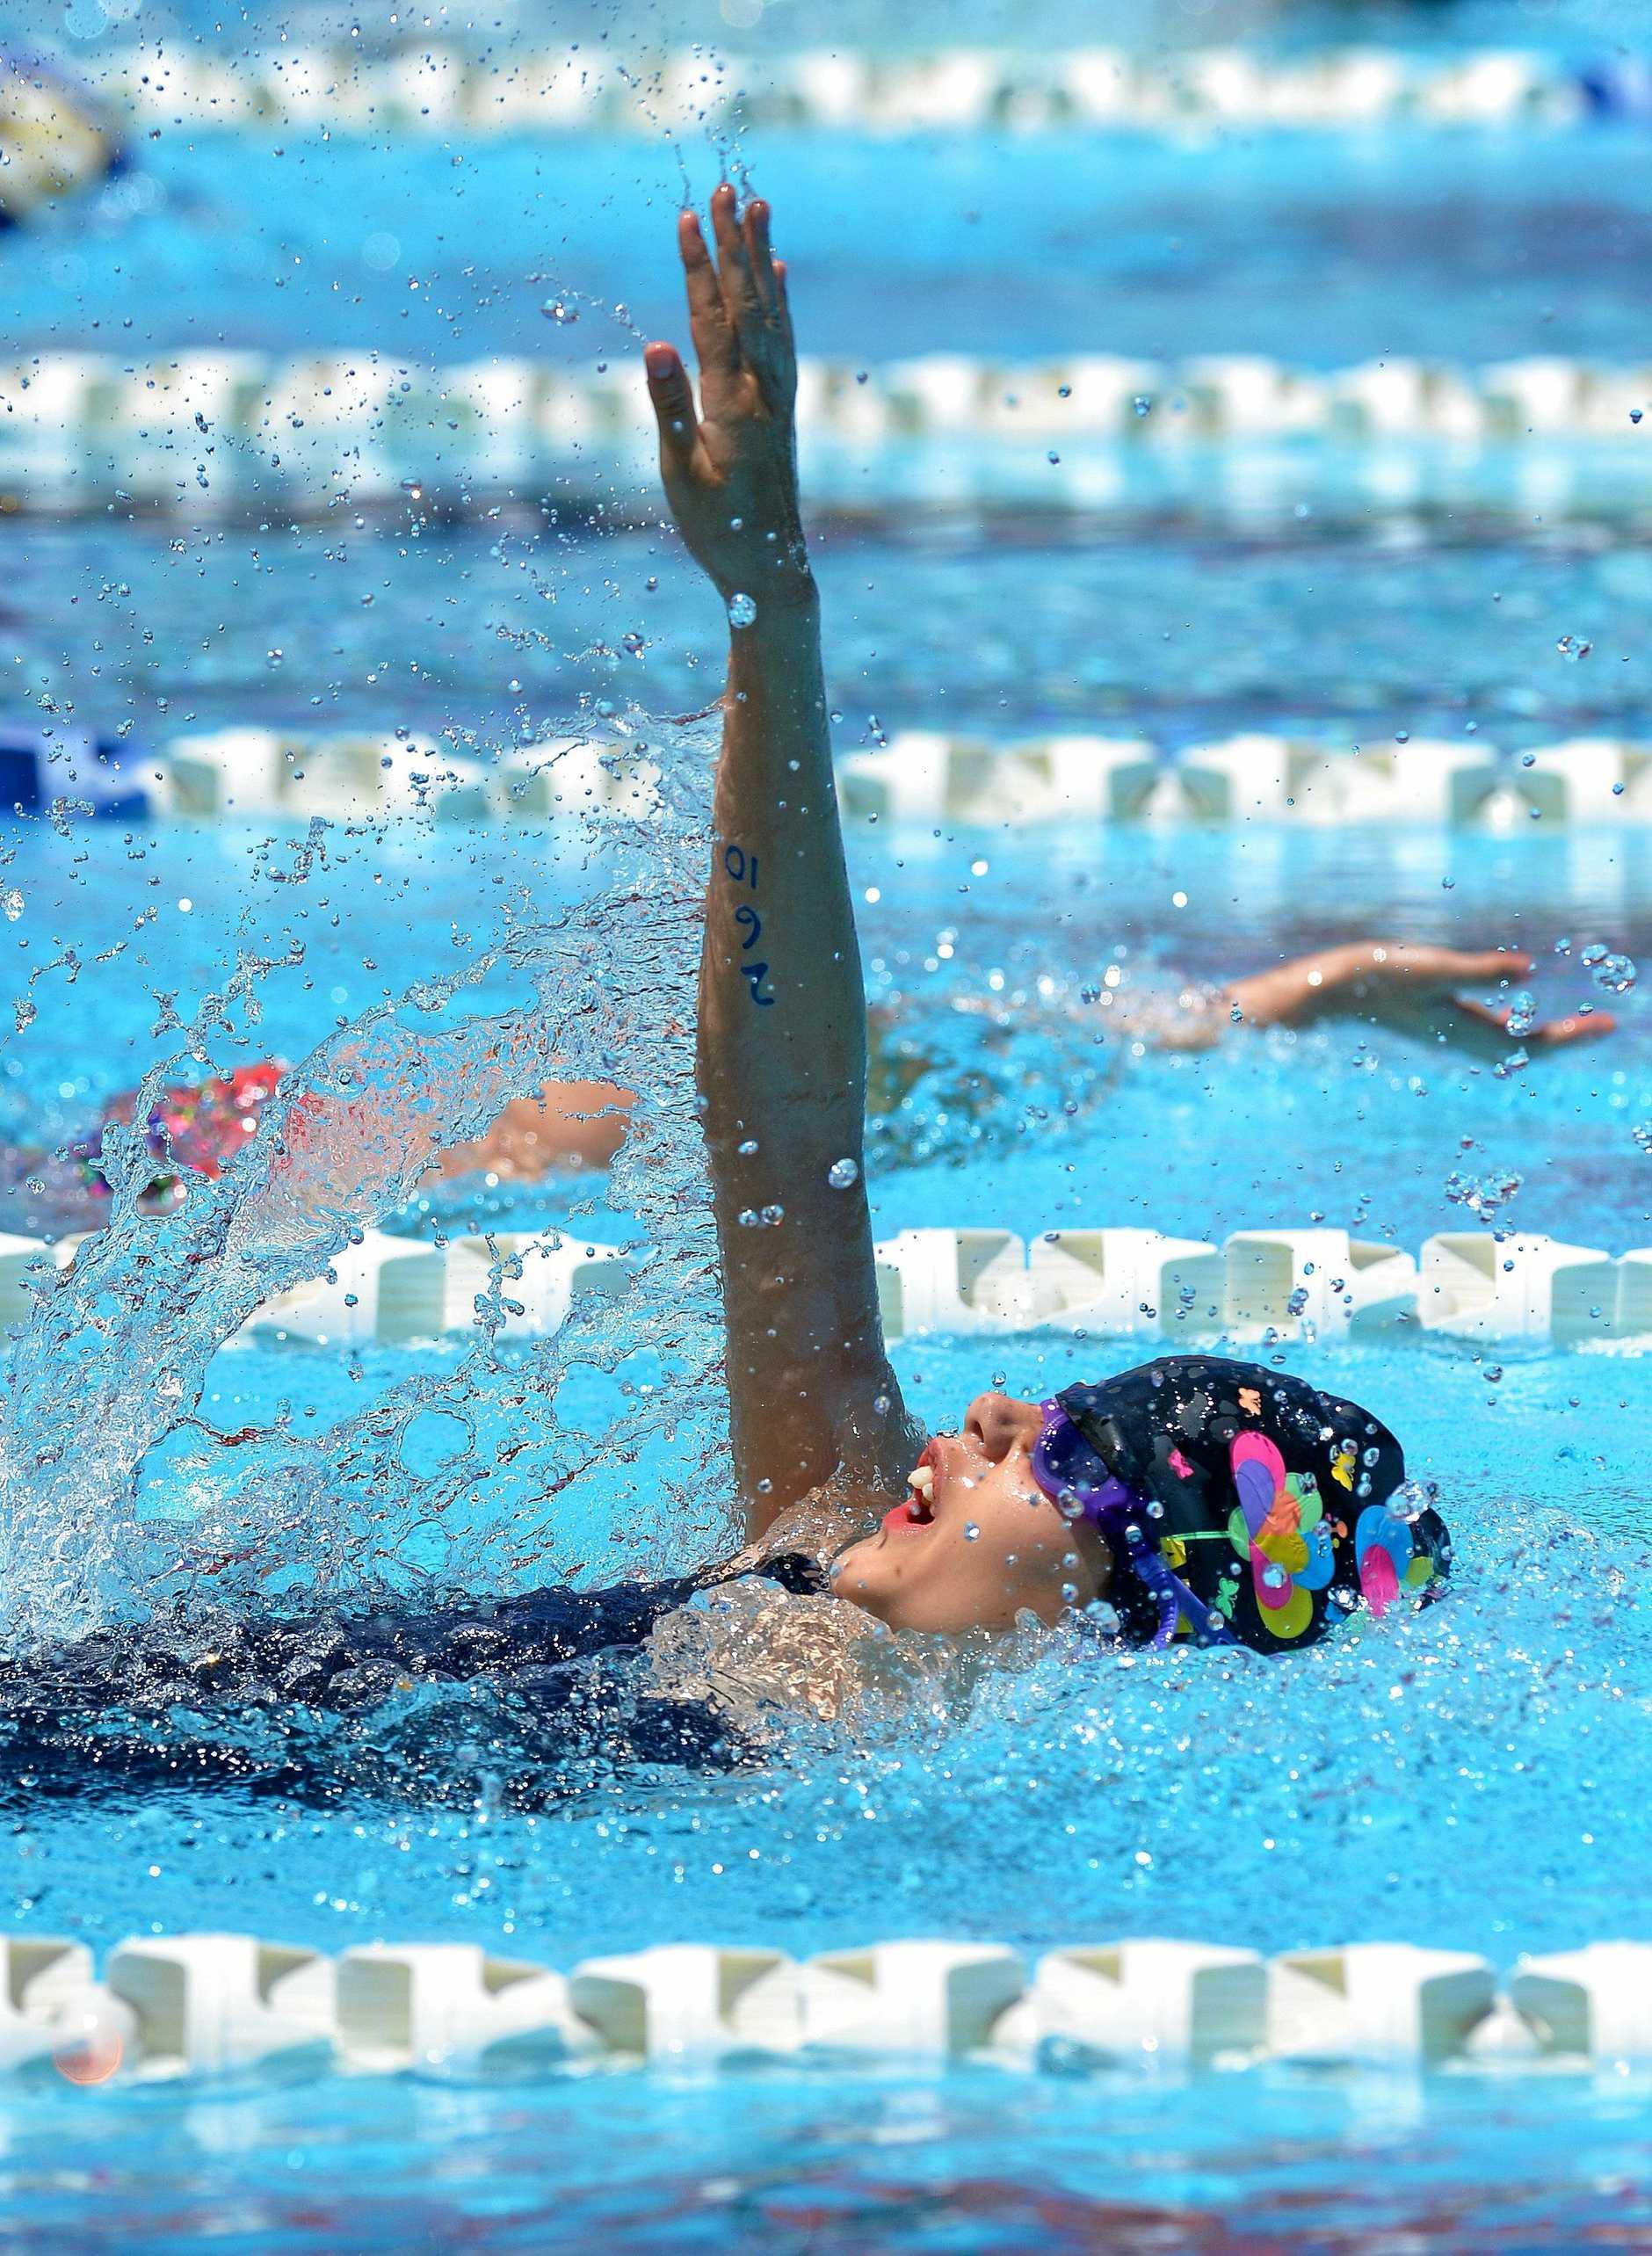 Action from the Woogaroo Swimming Carnival held at Bundamba Swim Centre on Saturday. 8-11yrs 50 backstroke.